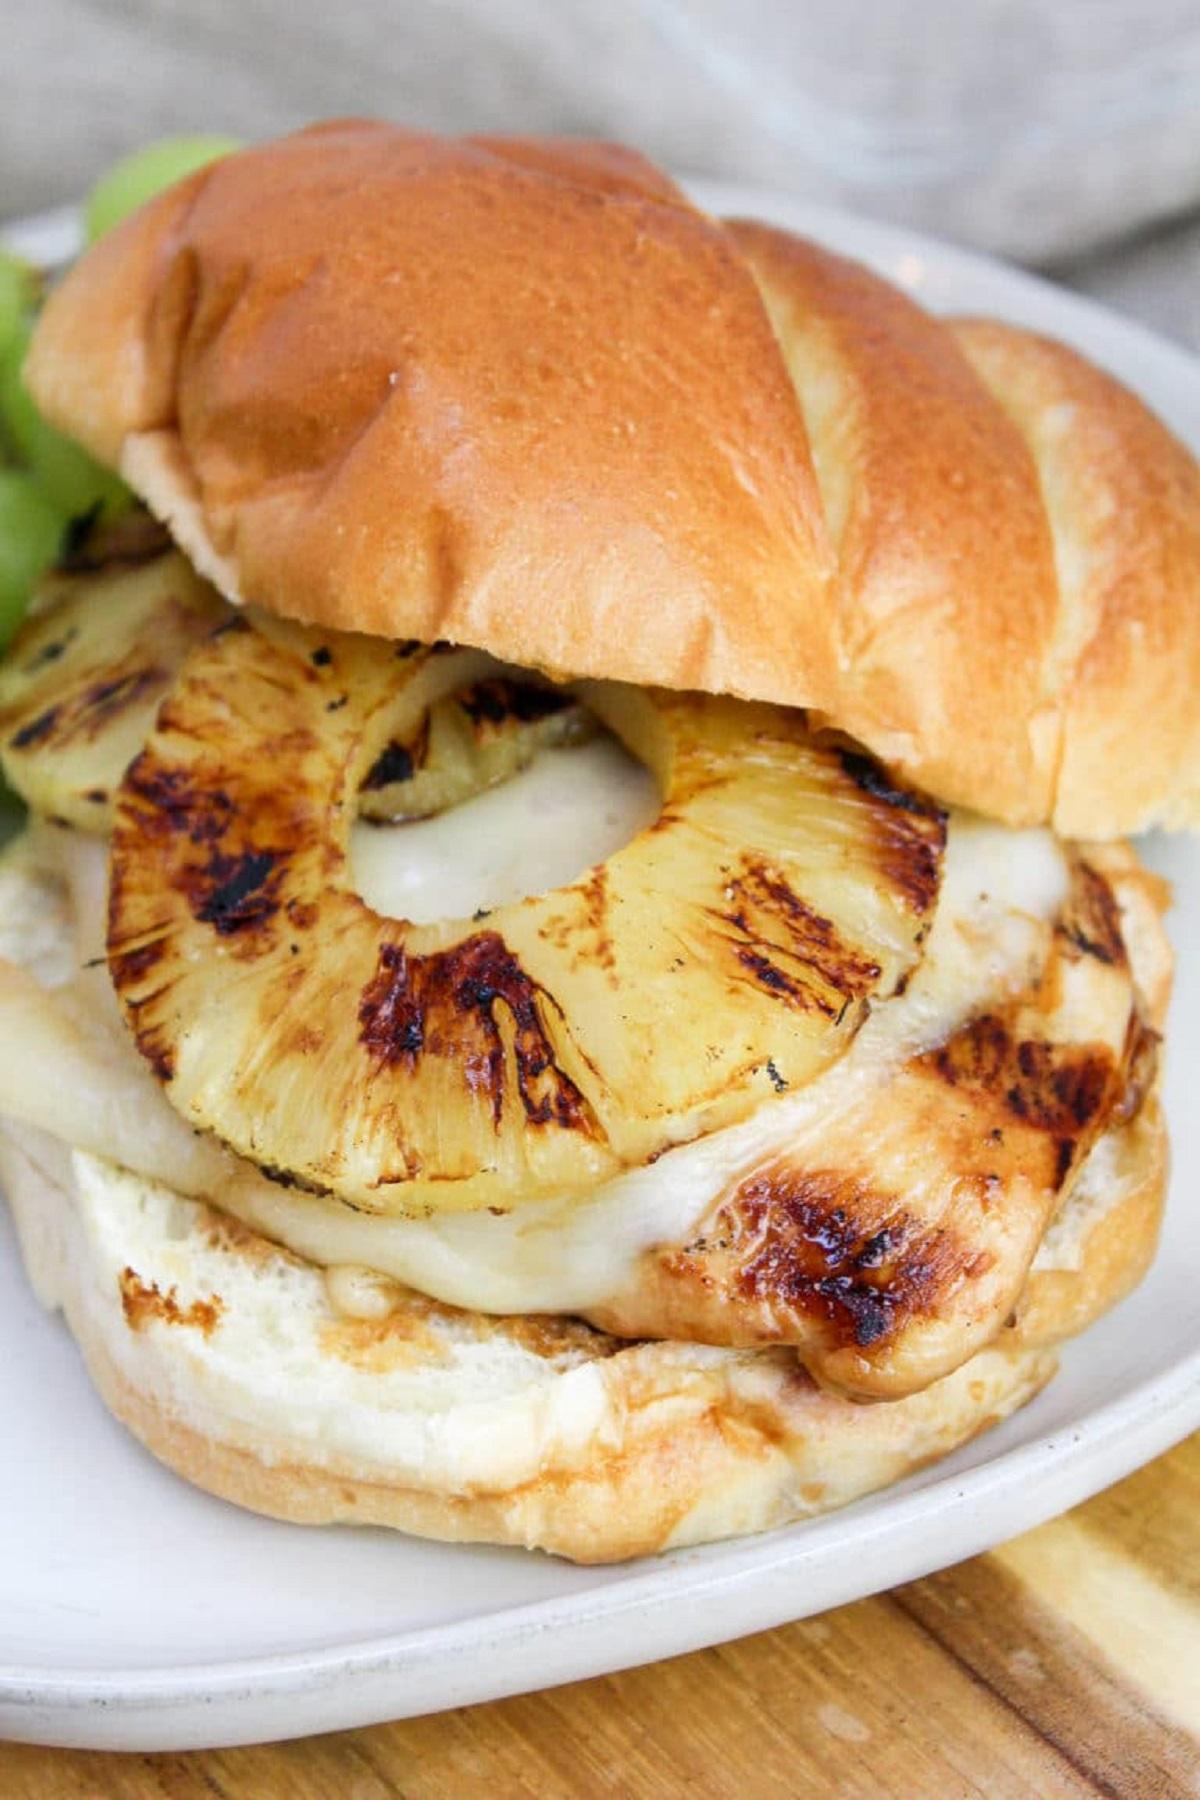 Hawaiian chicken sandwich on a plate